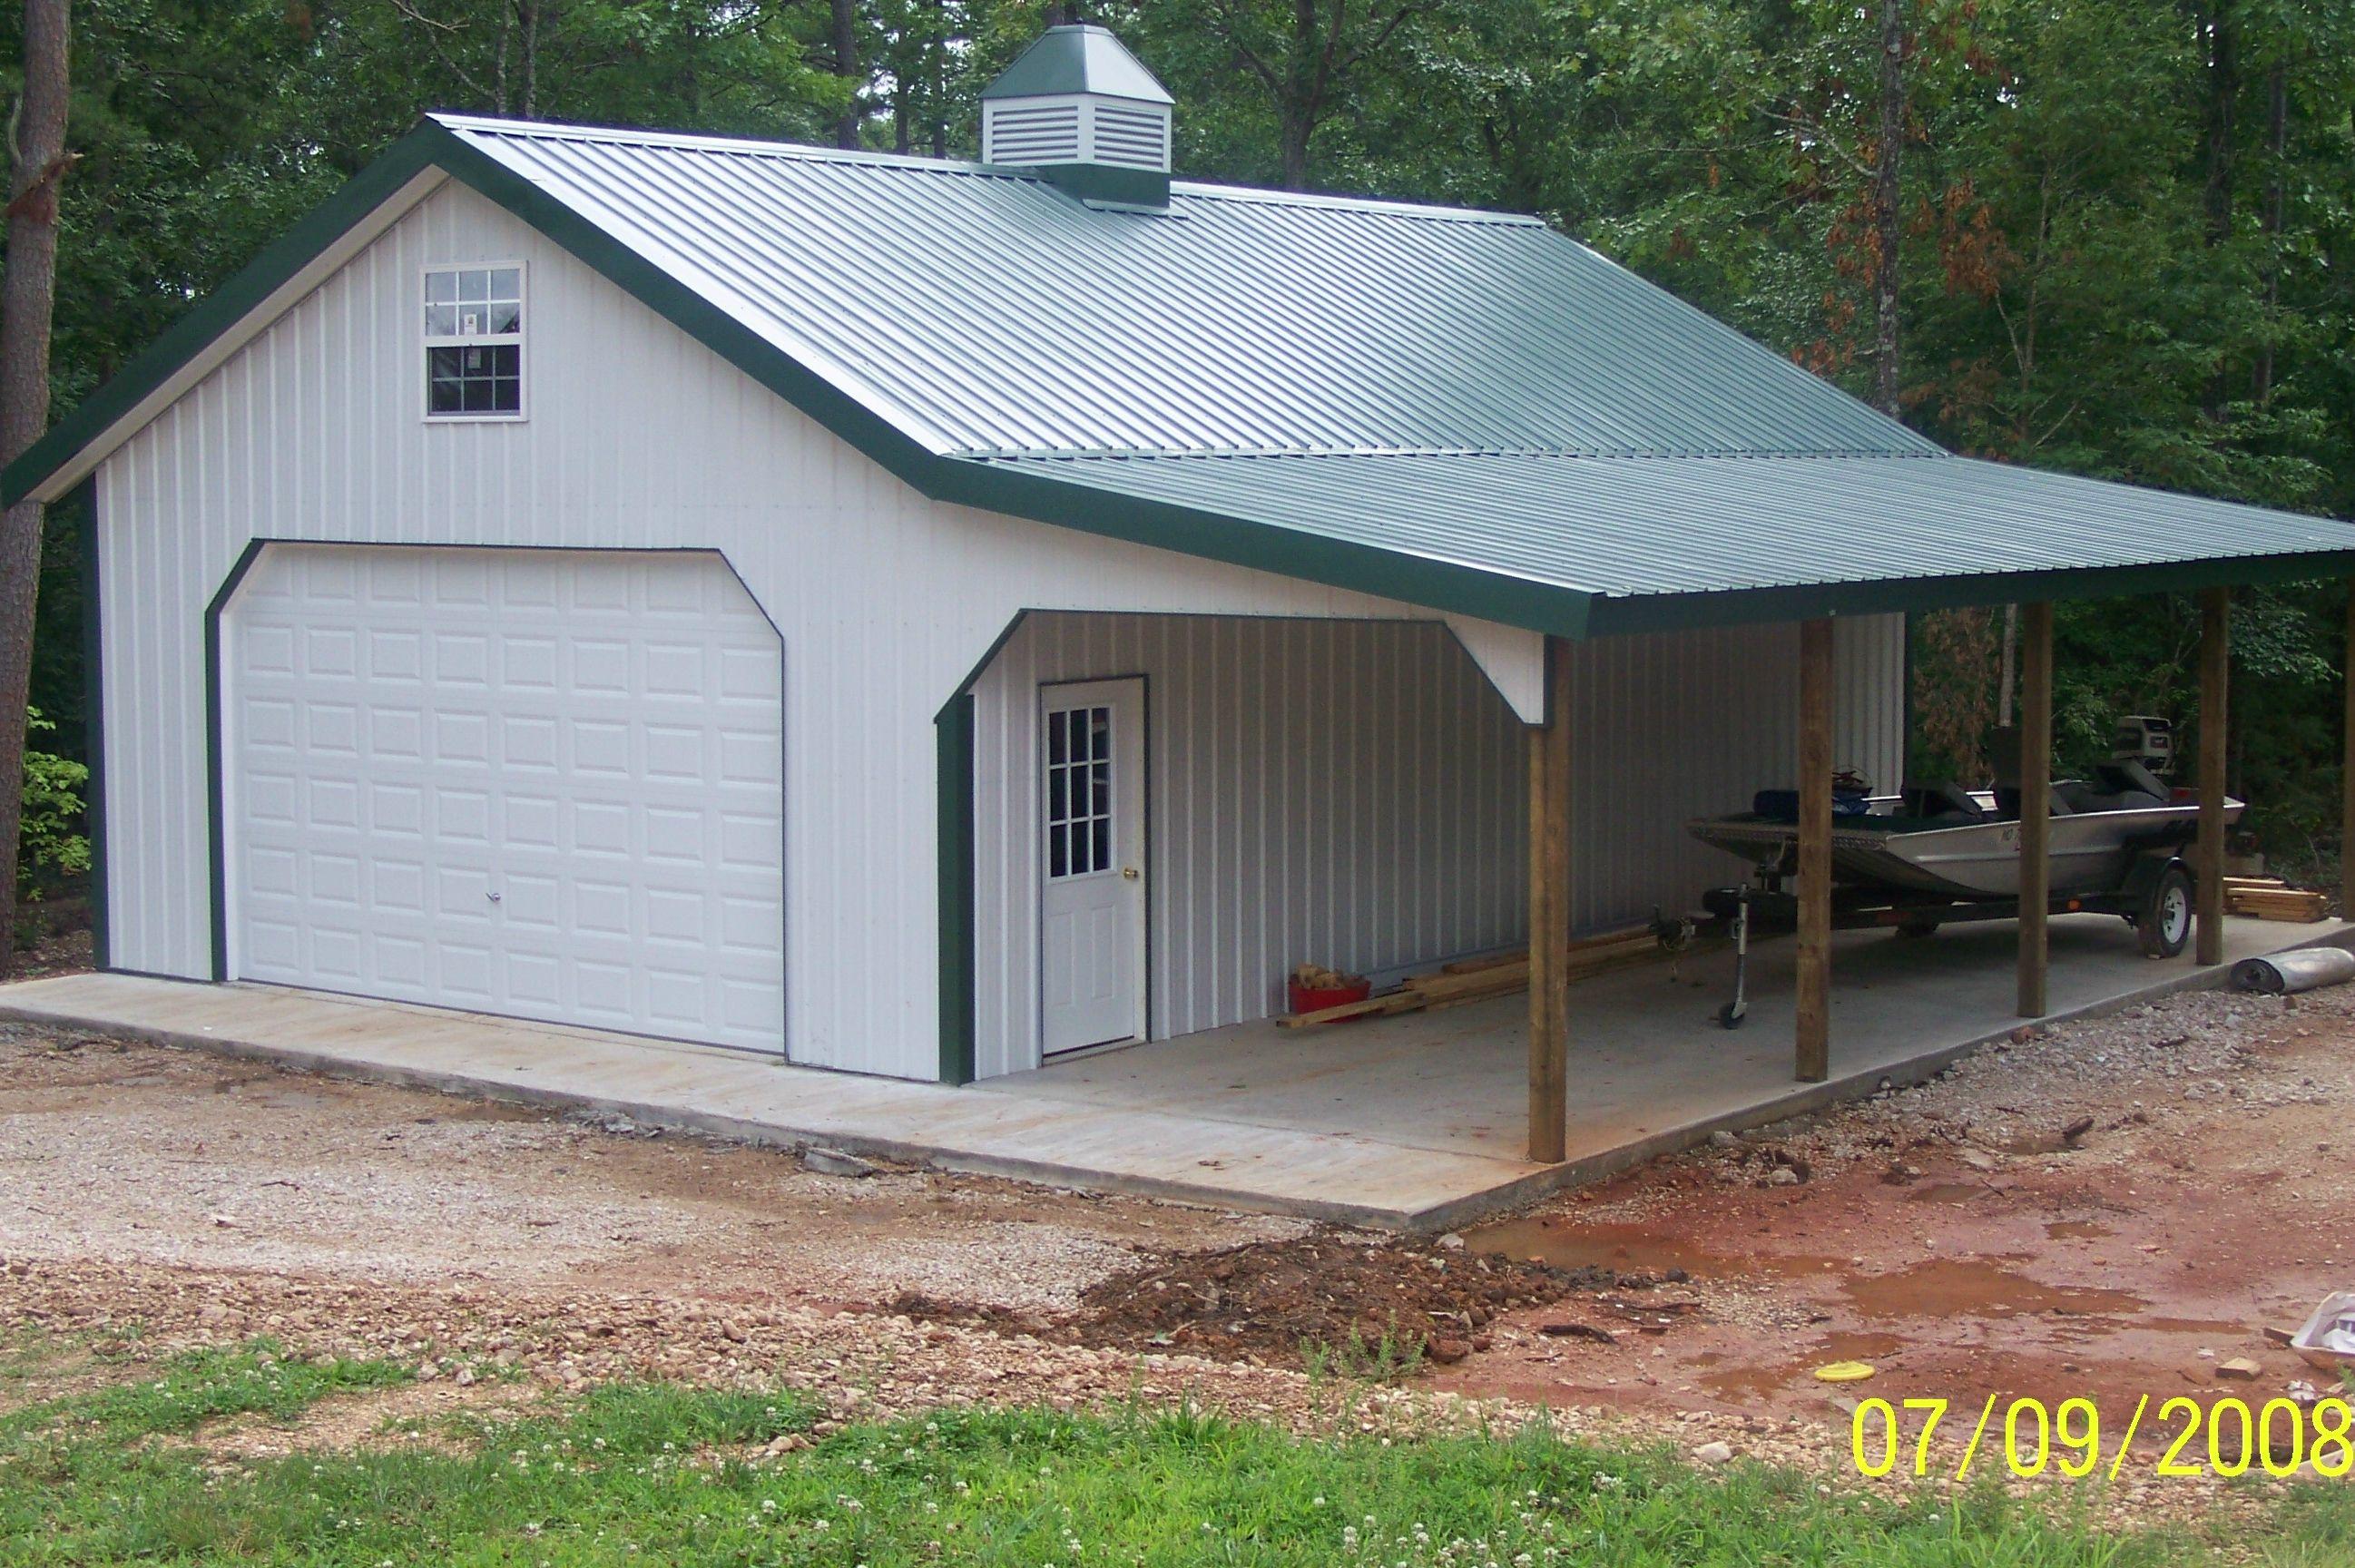 Garage plans 58 garage plans and free diy building